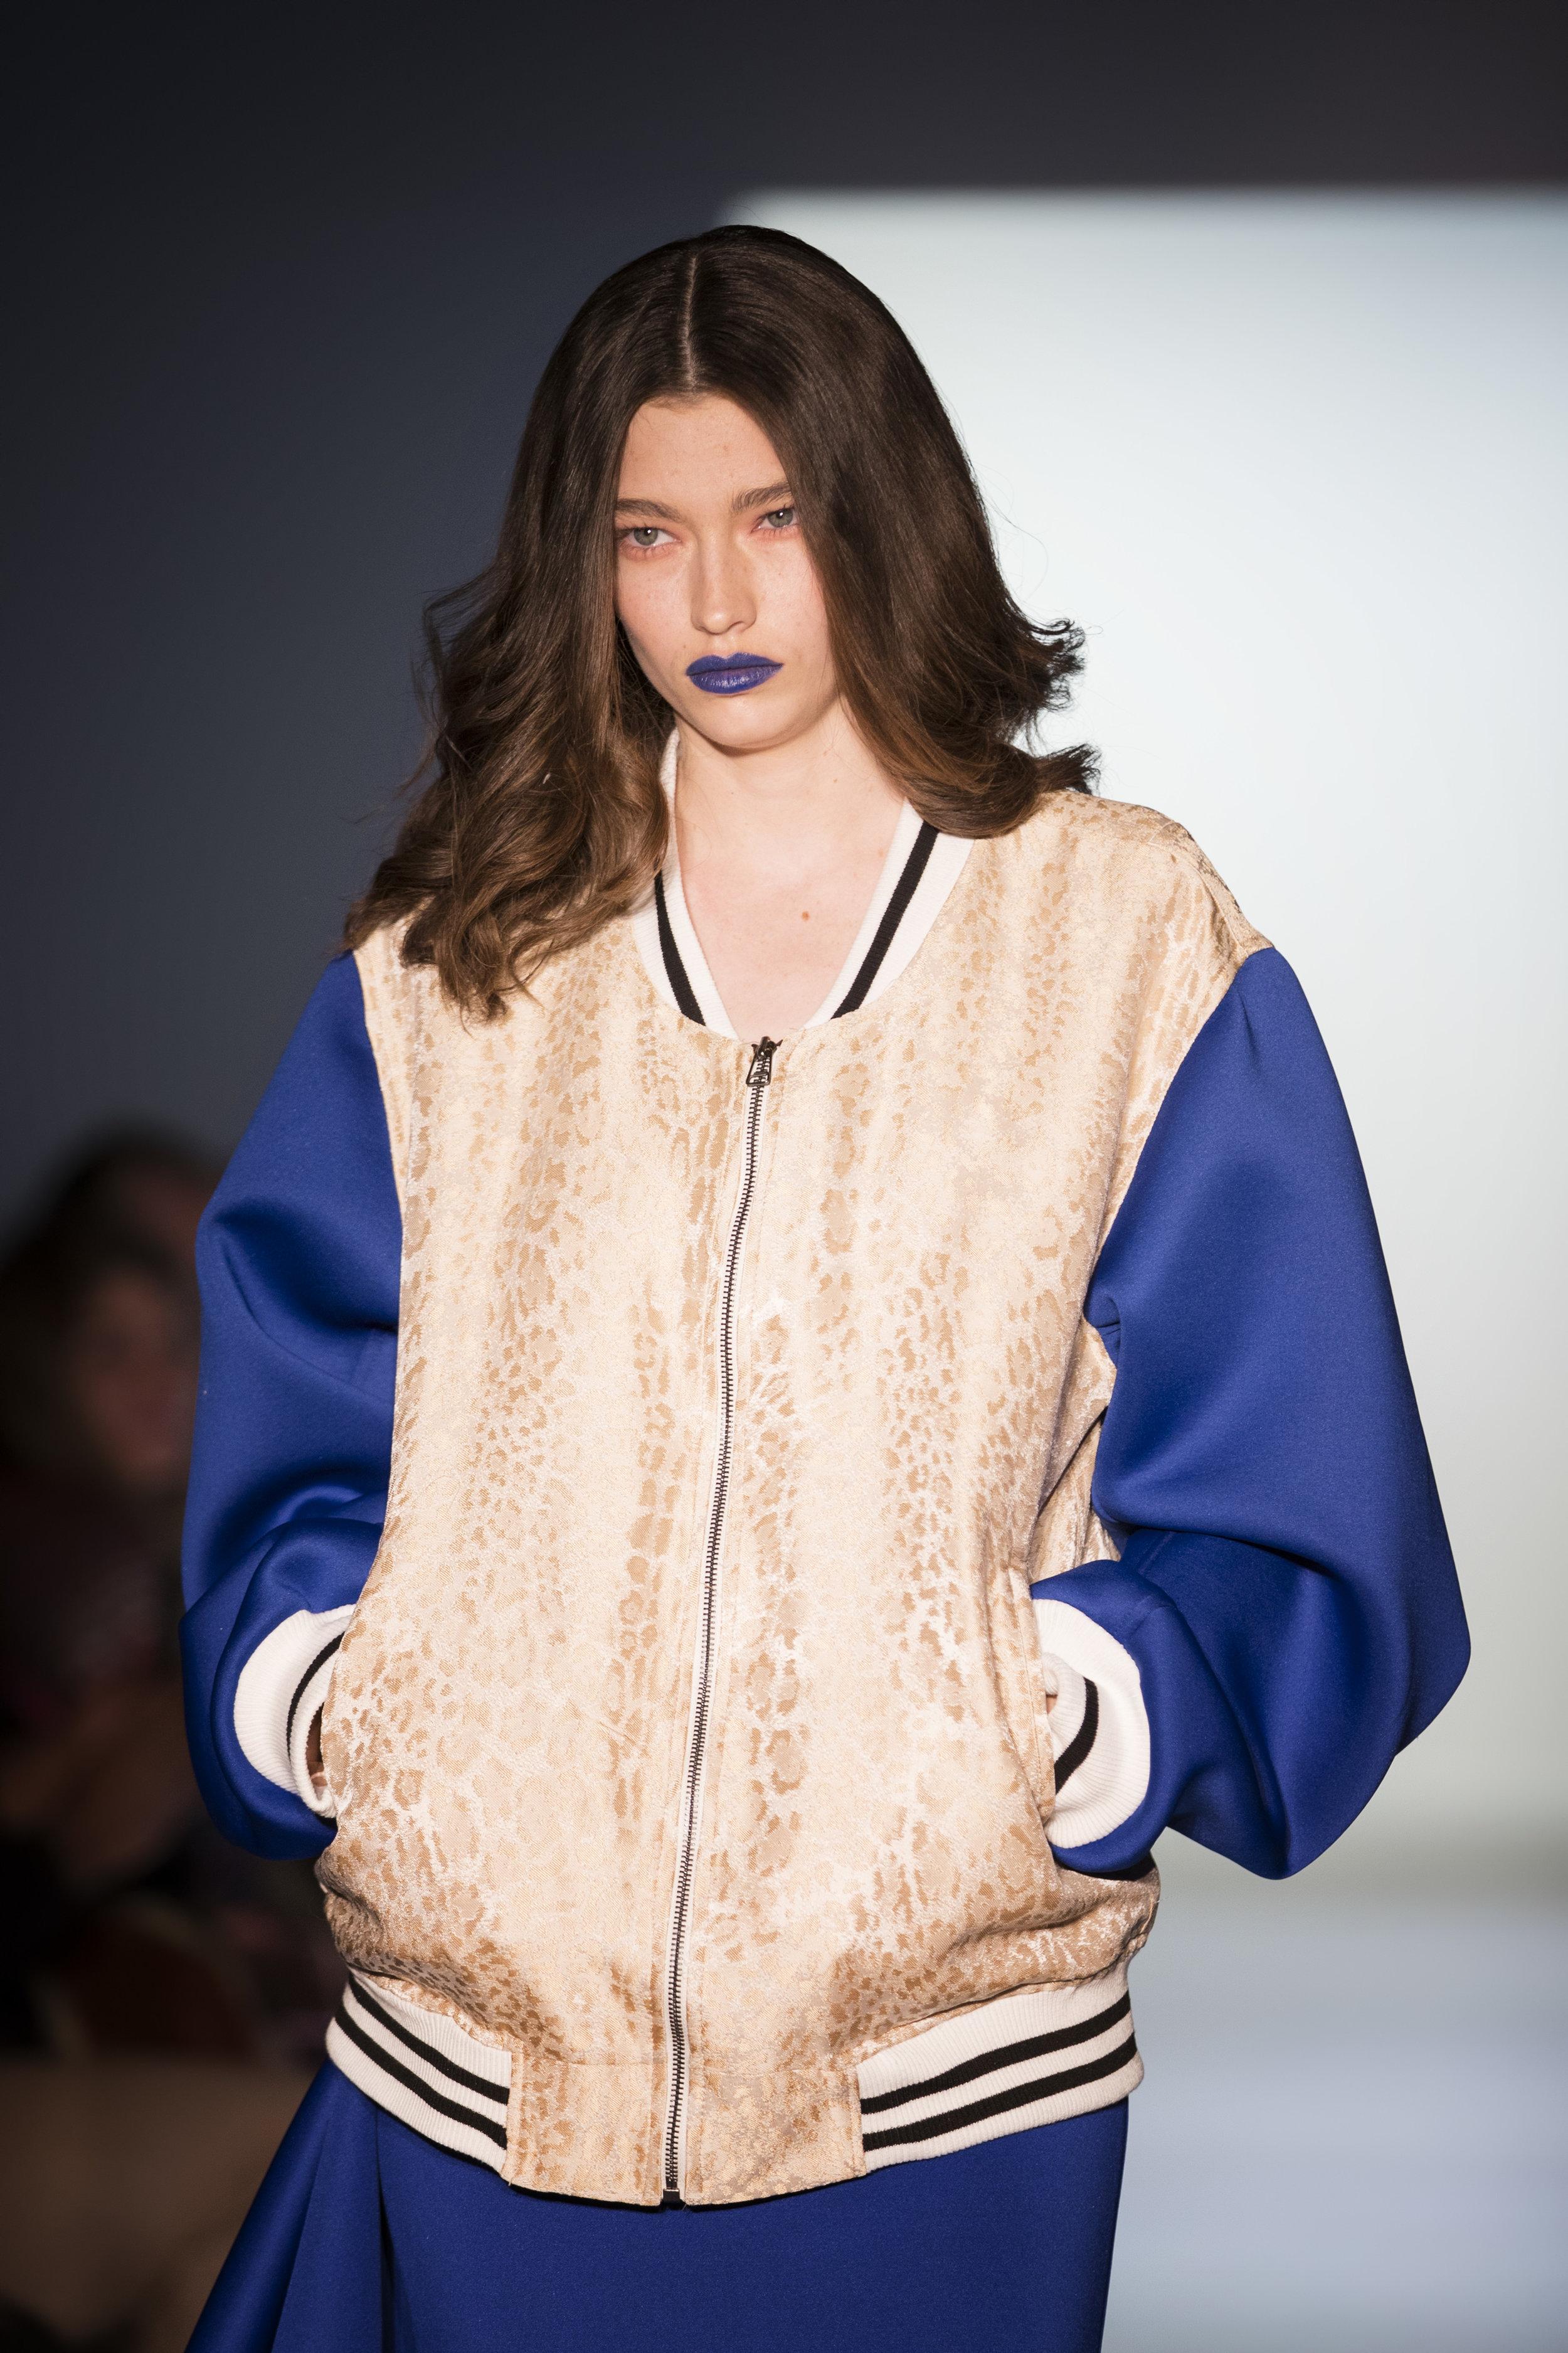 Massif Fashion Week 2017 Day 4 GIA New York Guillermo Irias - 021.jpg